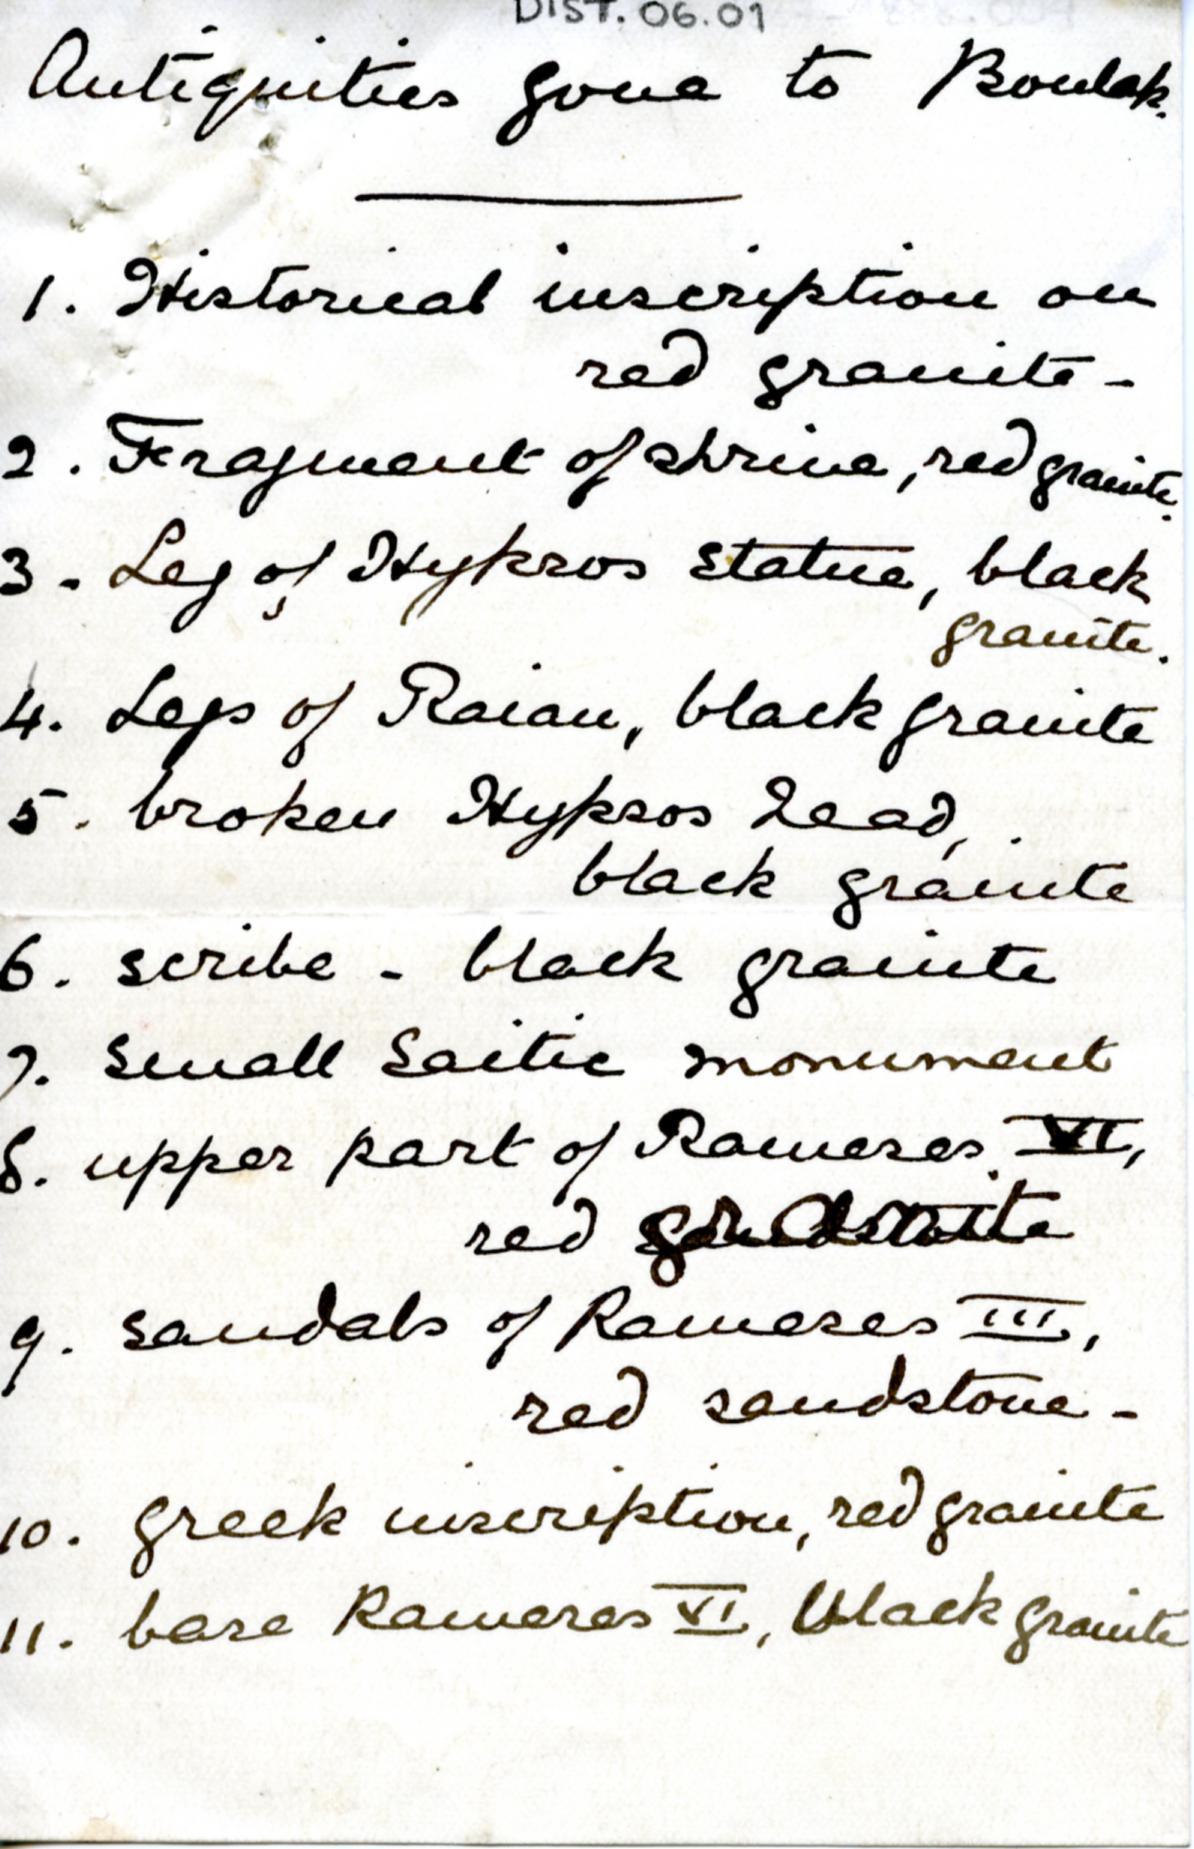 1887-1889 Tell el-Yahudiya, Teranneh, Heliopolis, Bubastis DIST.06.01